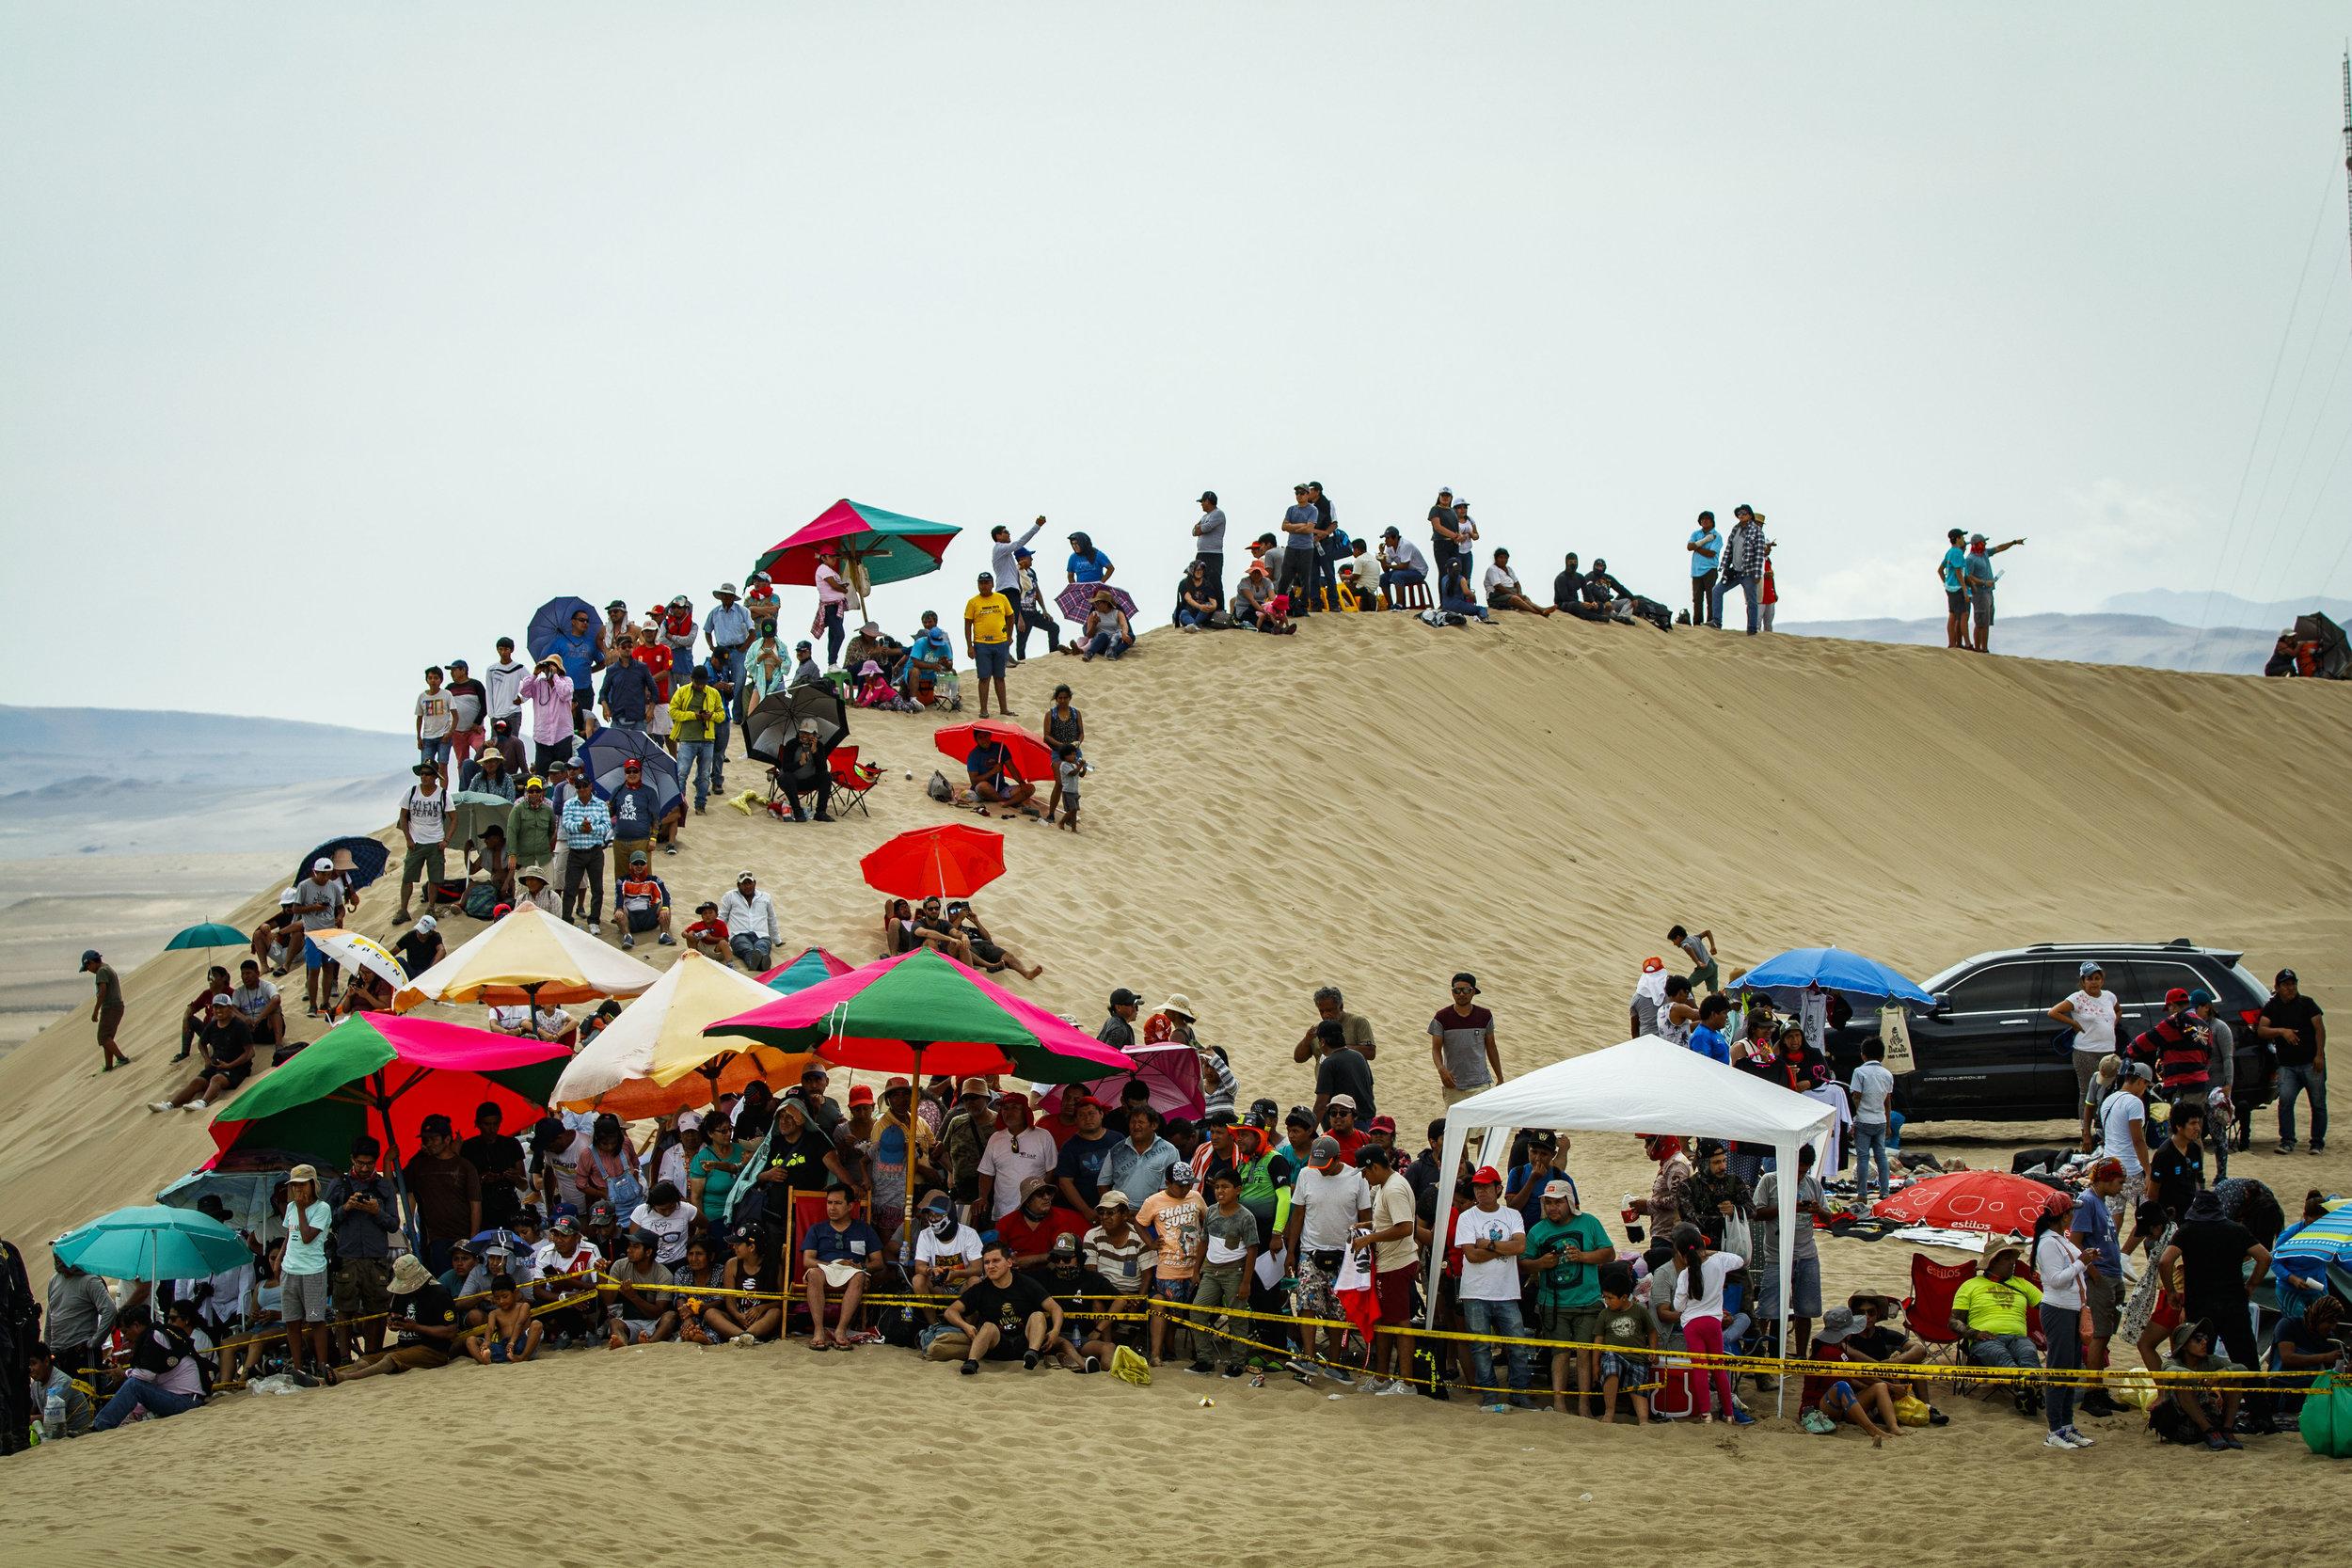 CaseyCurrie_Dakar_PiscoPeru_Stage1_CanAm_16X9_004.jpg